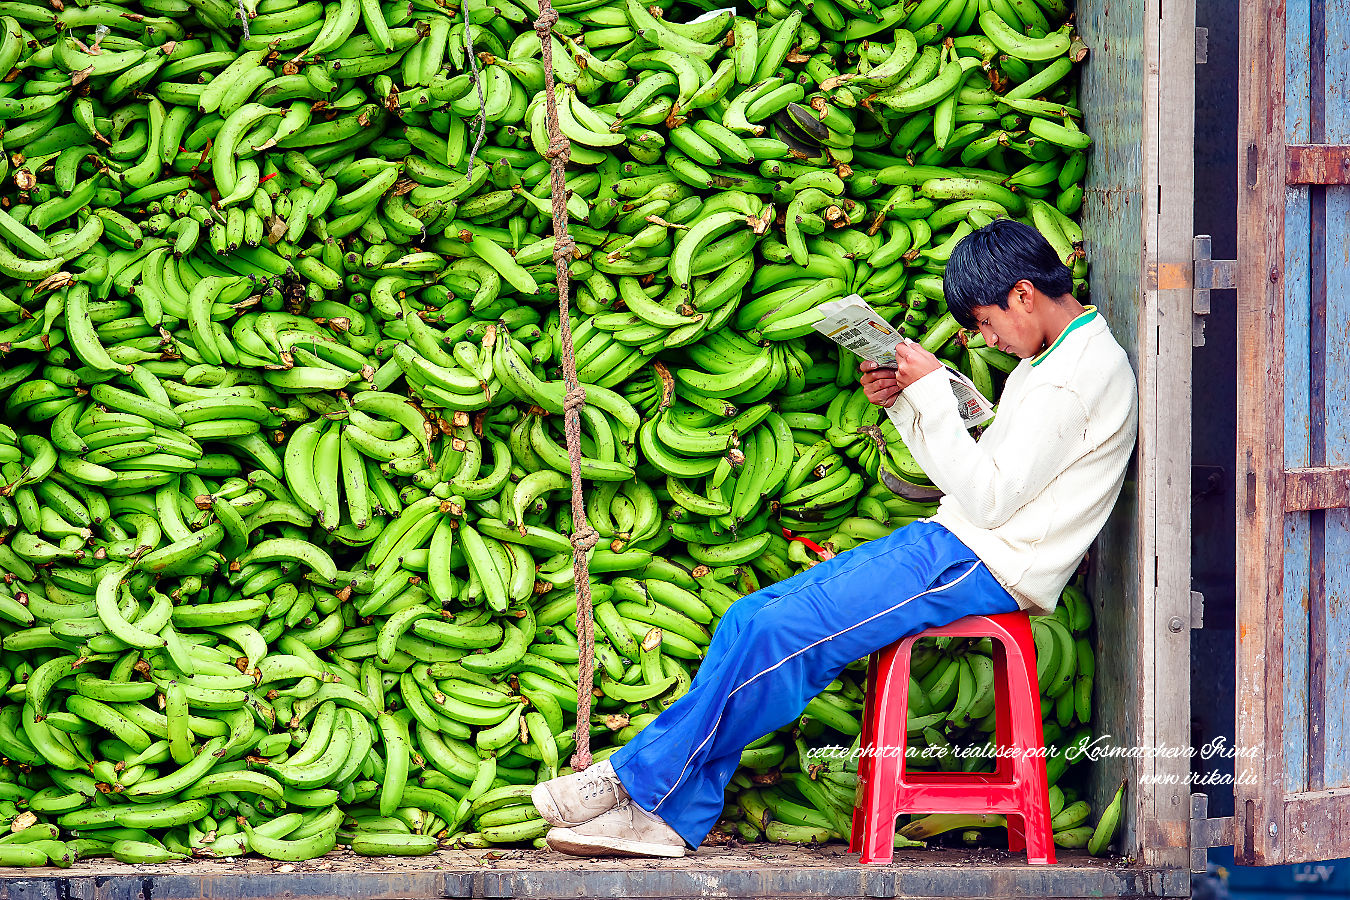 Plein de bananes vertes